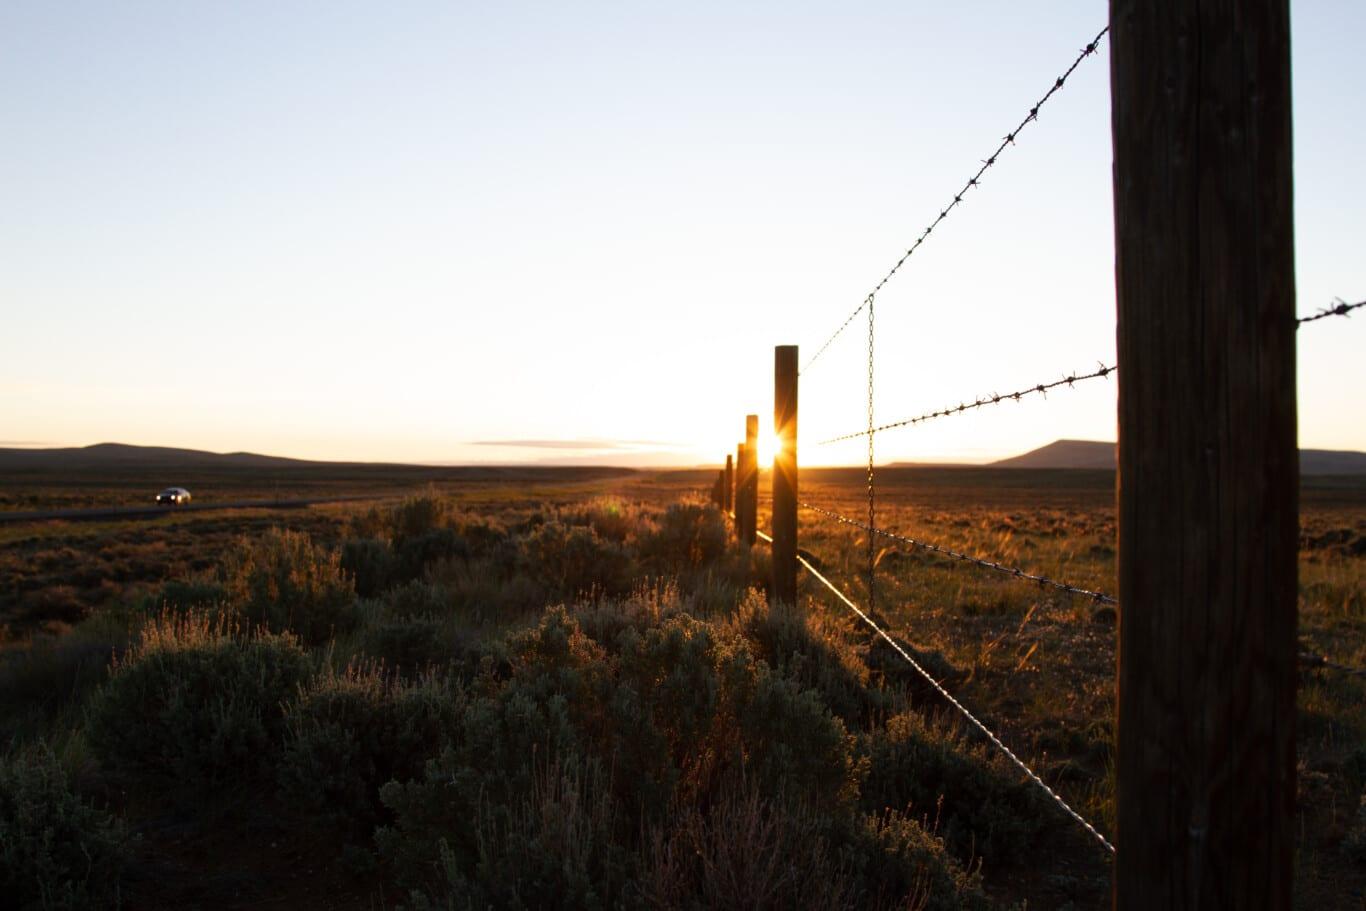 Sunrise Fenceline near Farson